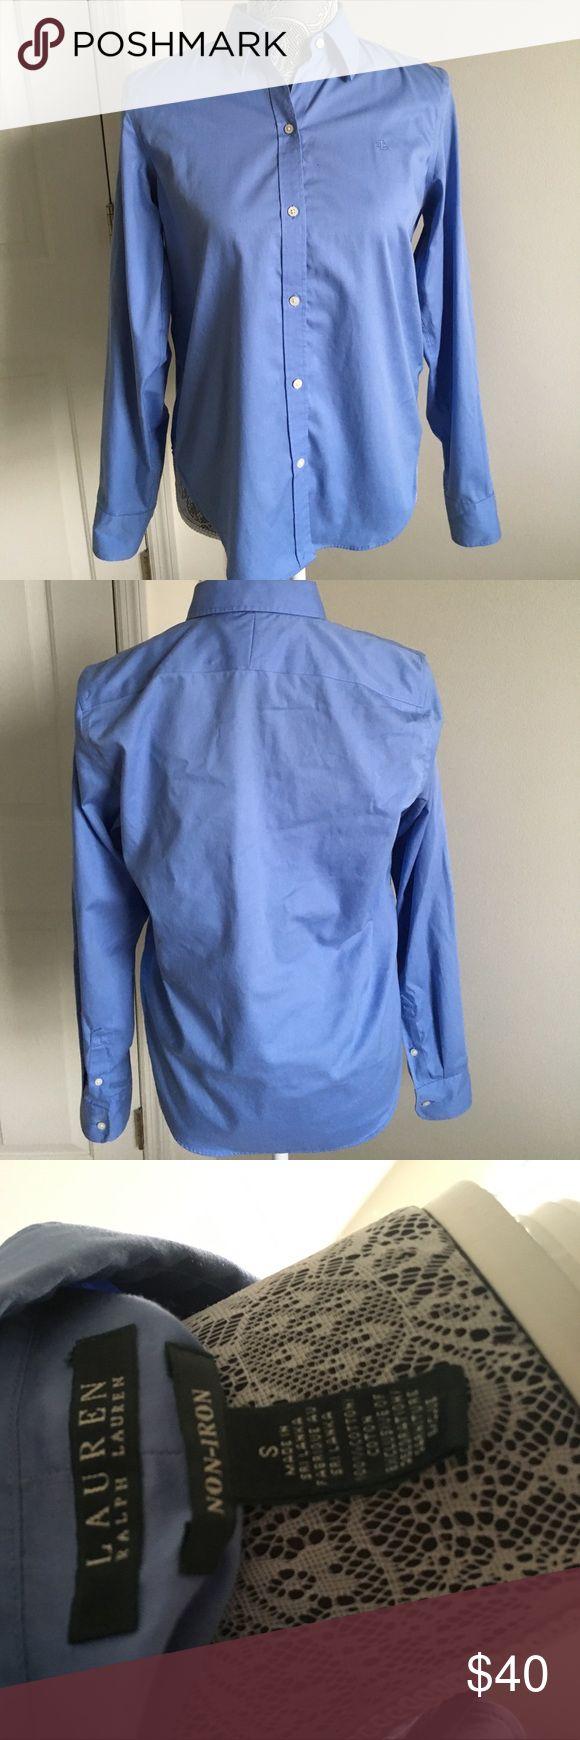 Ralp Lauren non-iron like new blue shirt Like new. Great condition. Non -iron. Ralph Lauren Tops Button Down Shirts